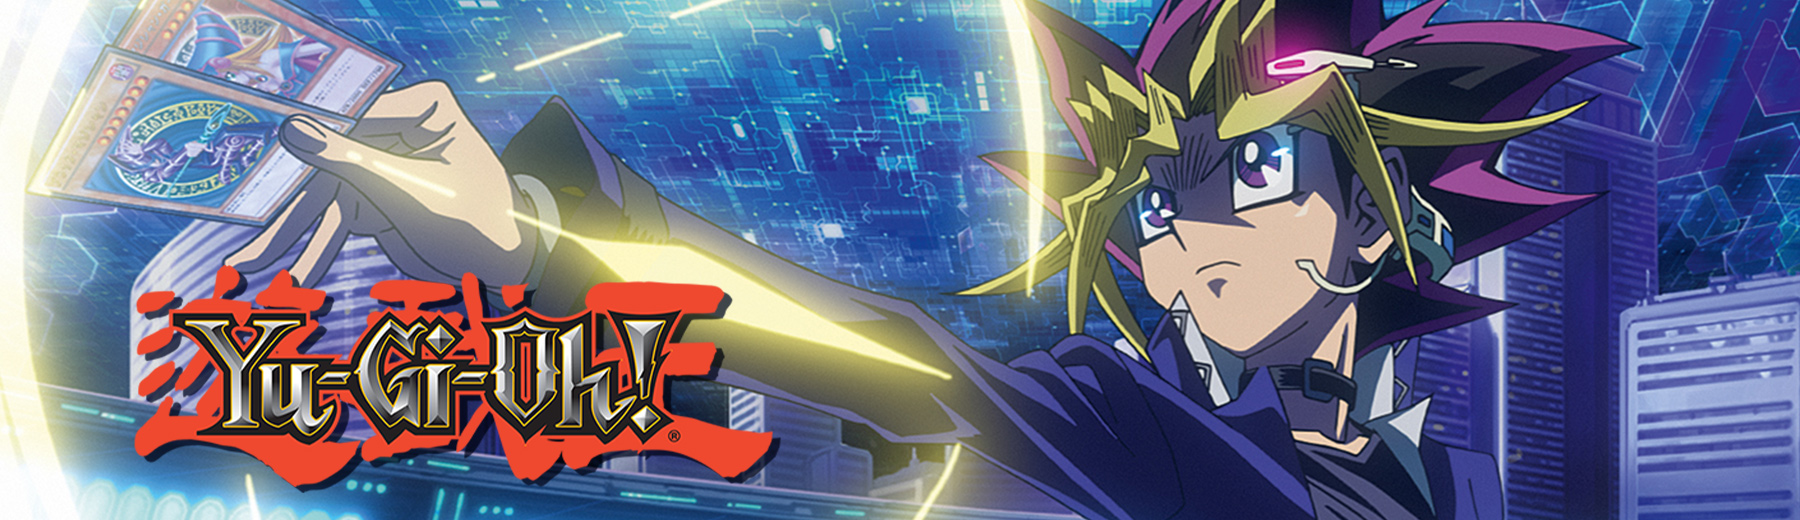 Yu Gi Oh Fanartikel Zum Anime Elbenwald